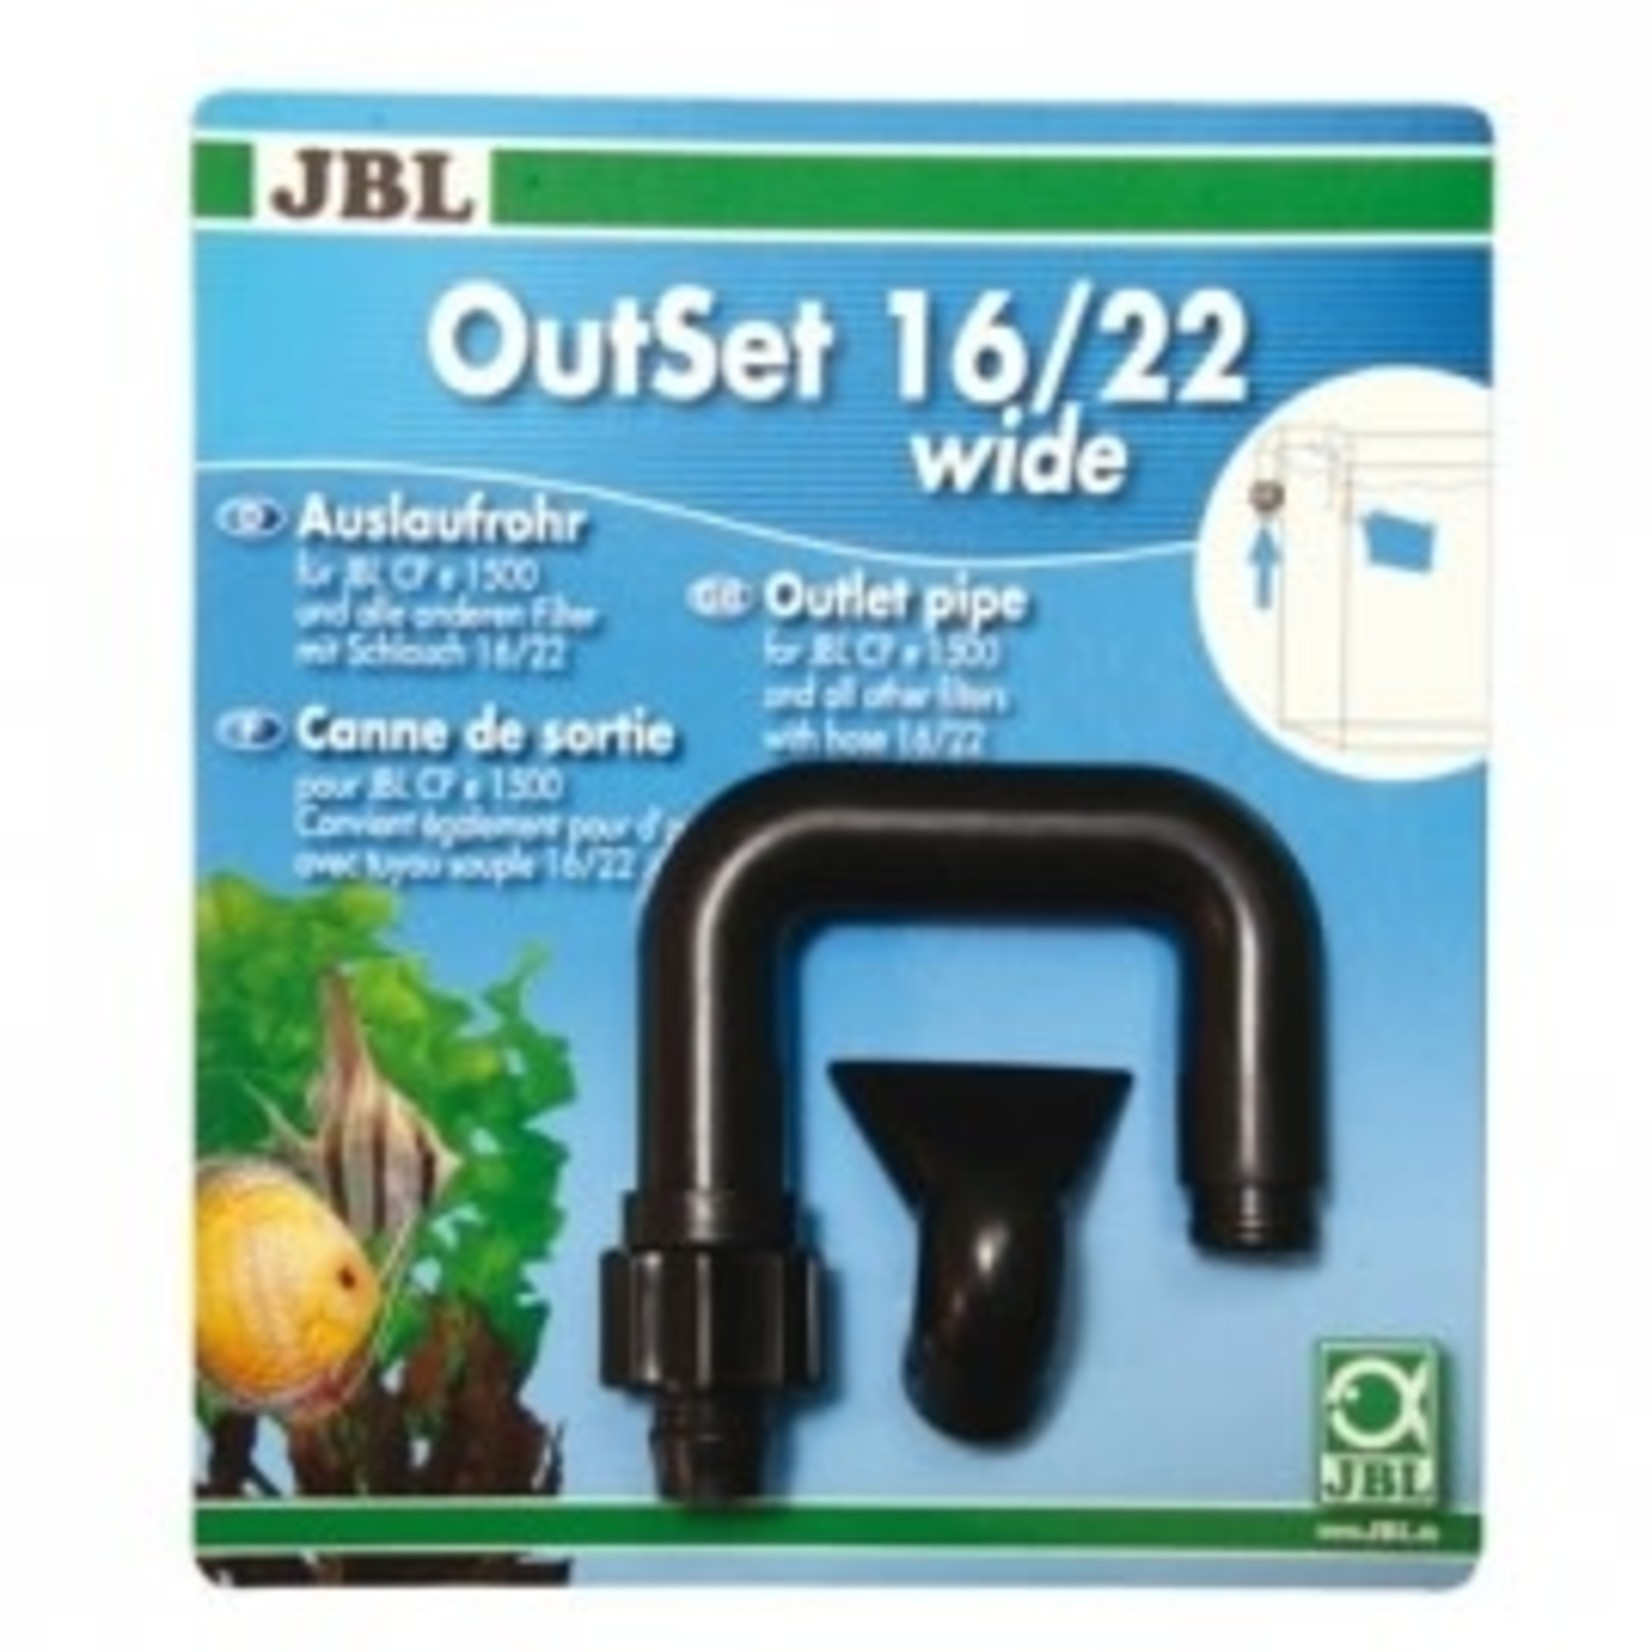 JBL Canne JBL OutSet wide pour CP serie e